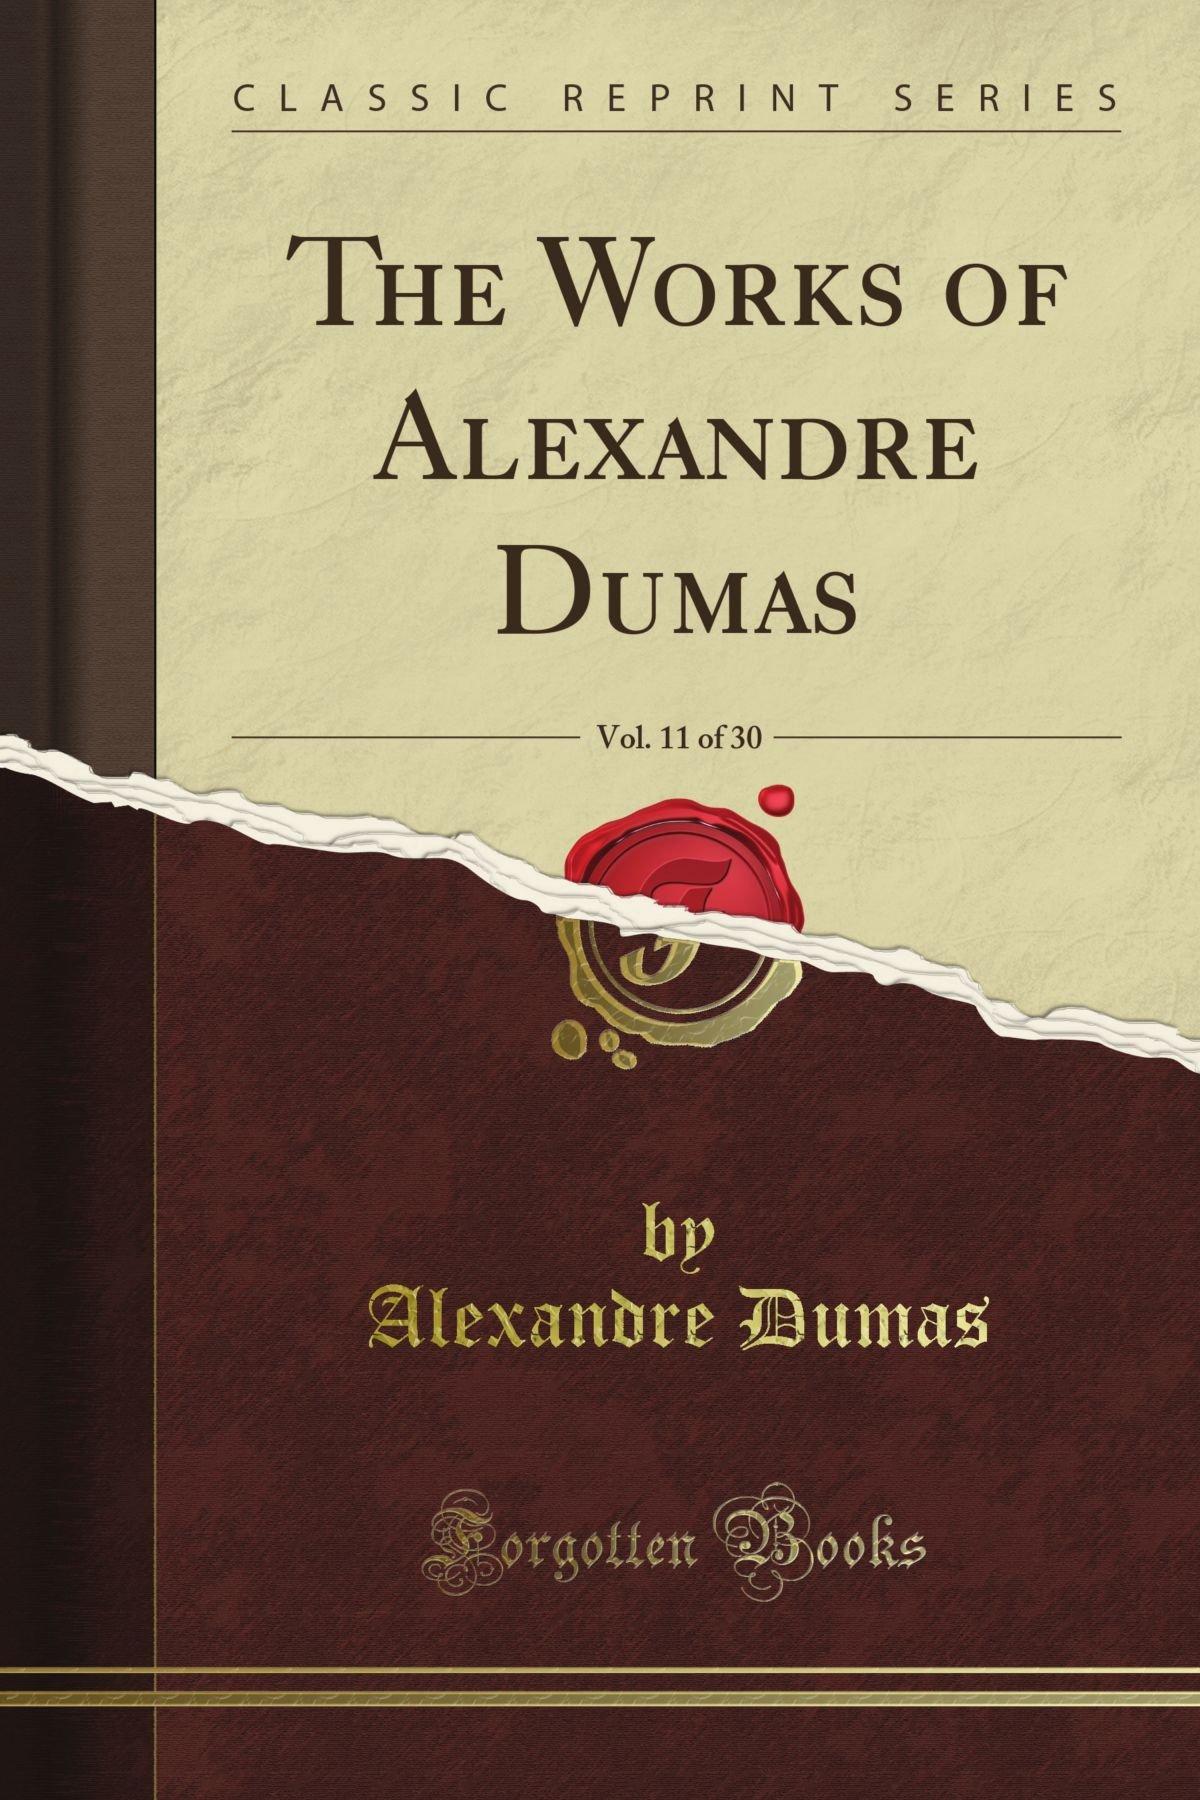 Read Online The Works of Alexandre Dumas, Vol. 11 of 30 (Classic Reprint) ebook